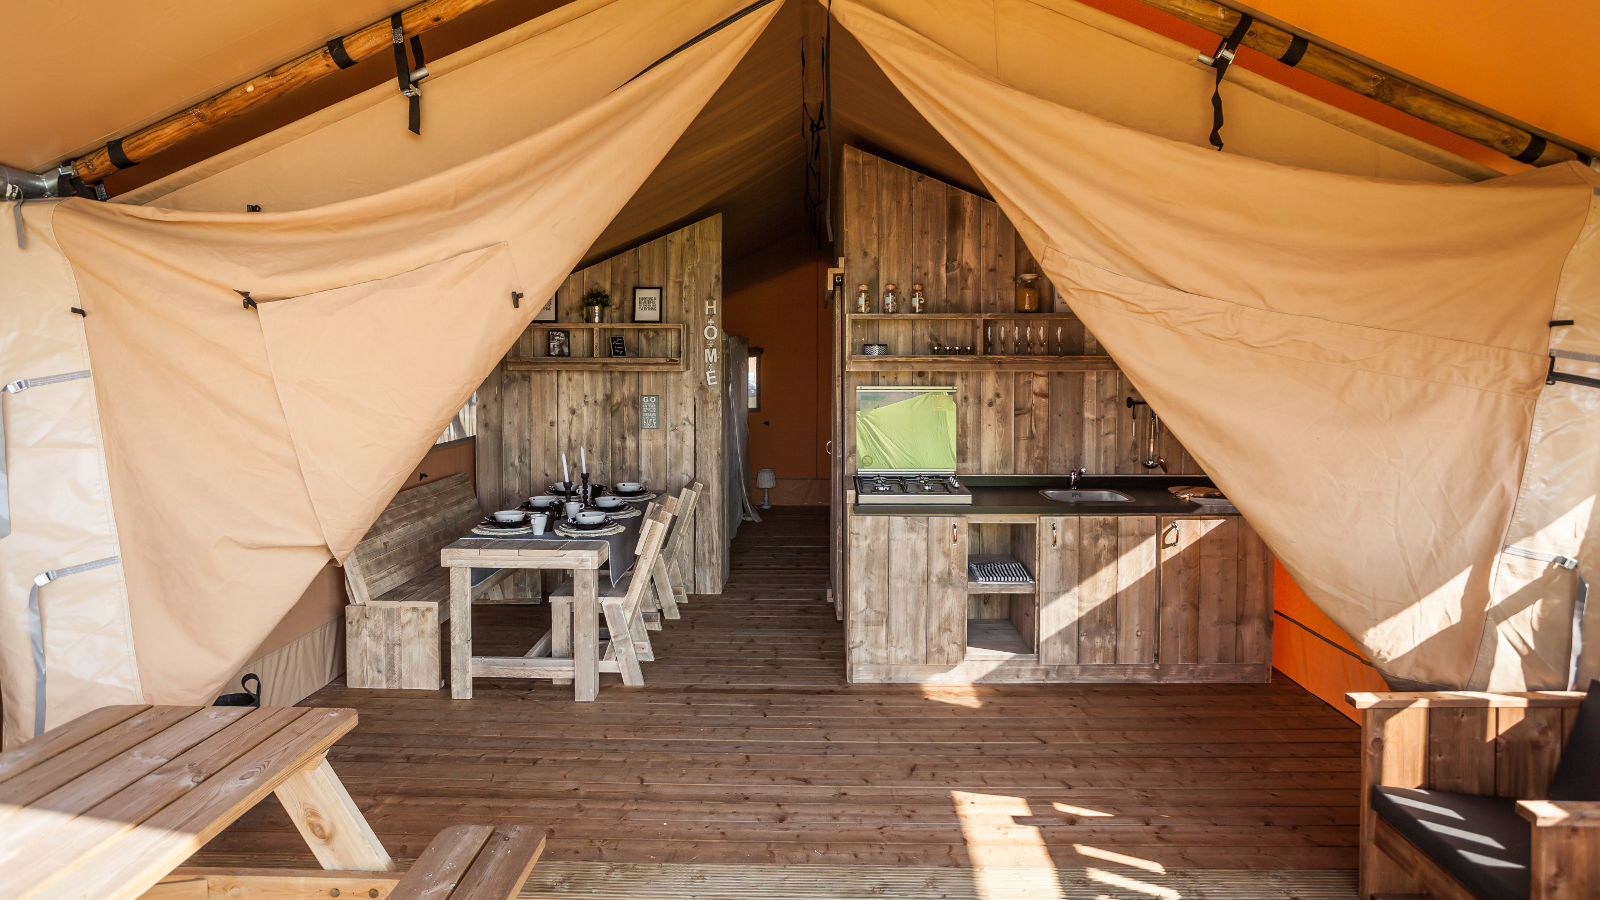 Safarizelt auf dem Camping Free Time